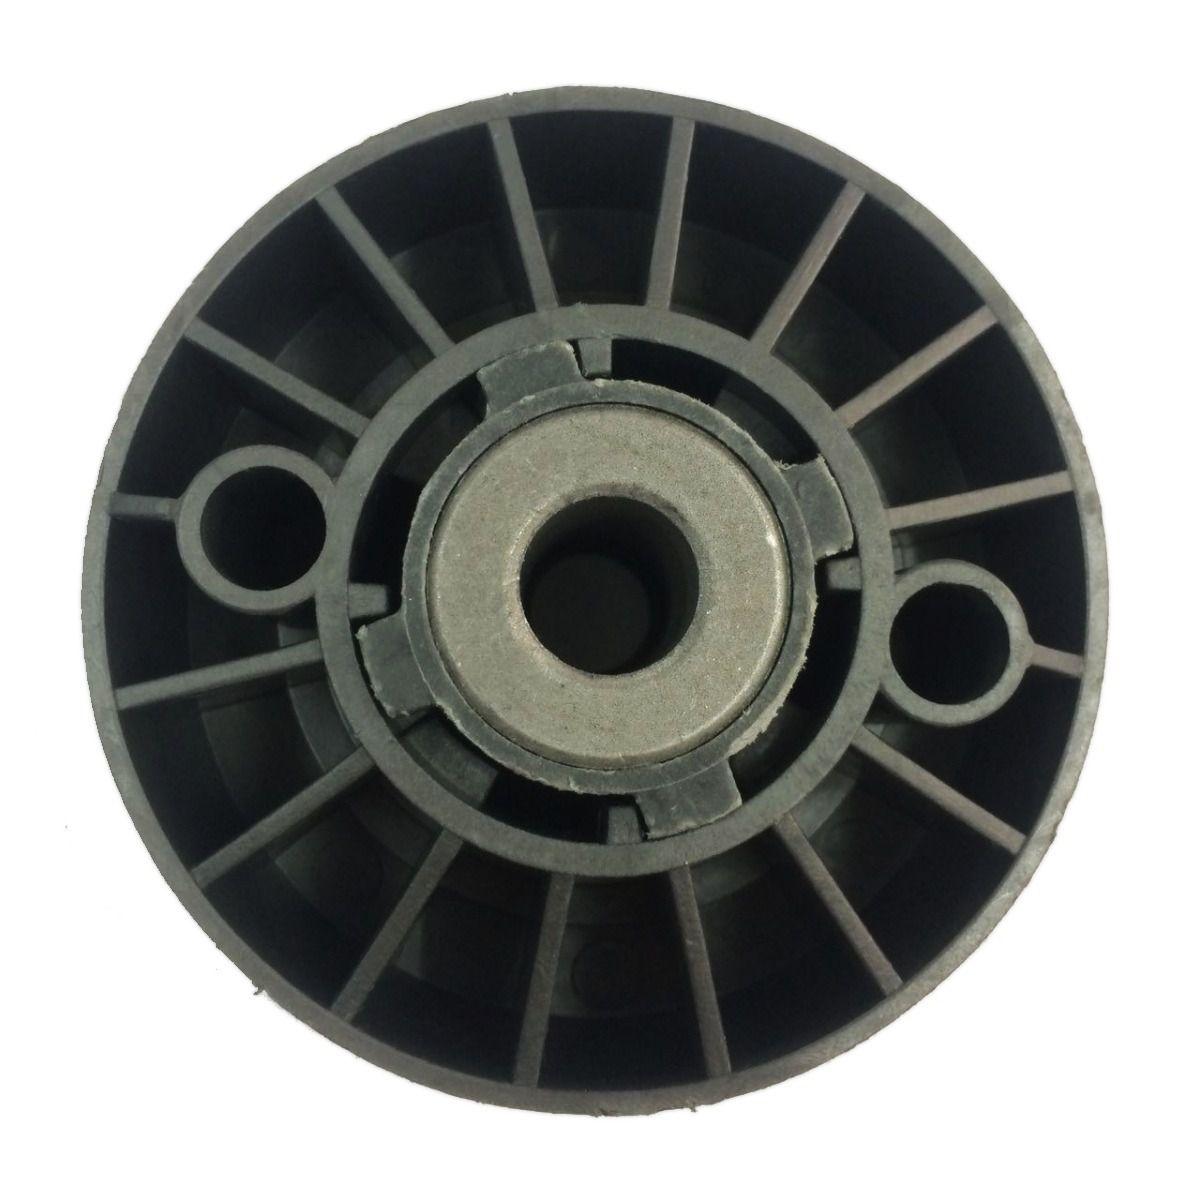 Agitador Batedor Lavadora Suggar Lavamax Lavamatic 10Kg